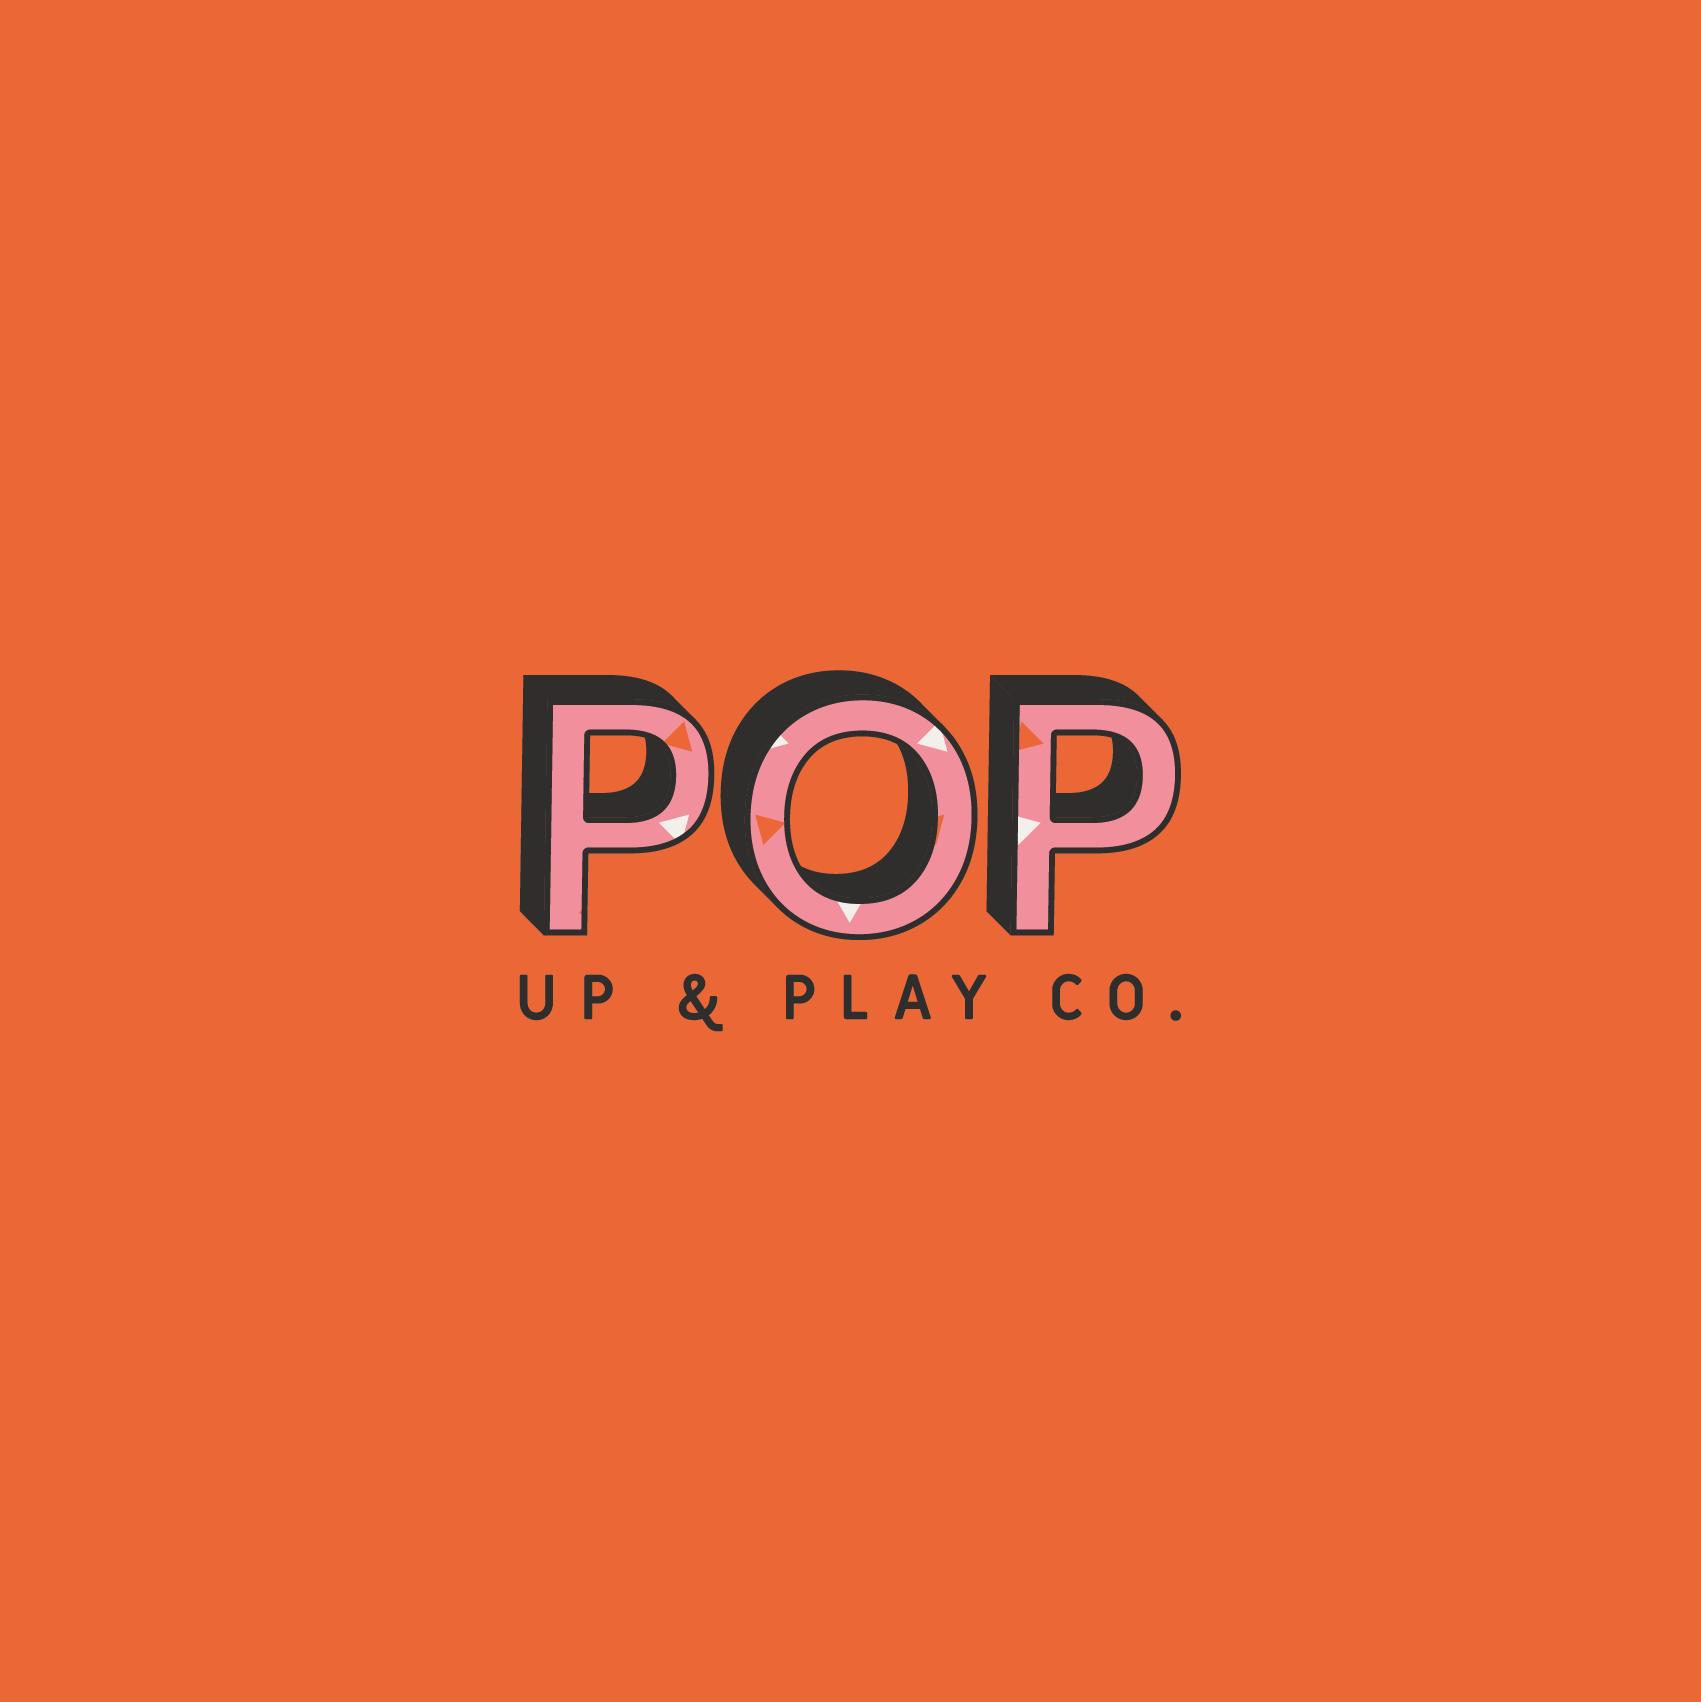 Pop Orange Sq@2x.png